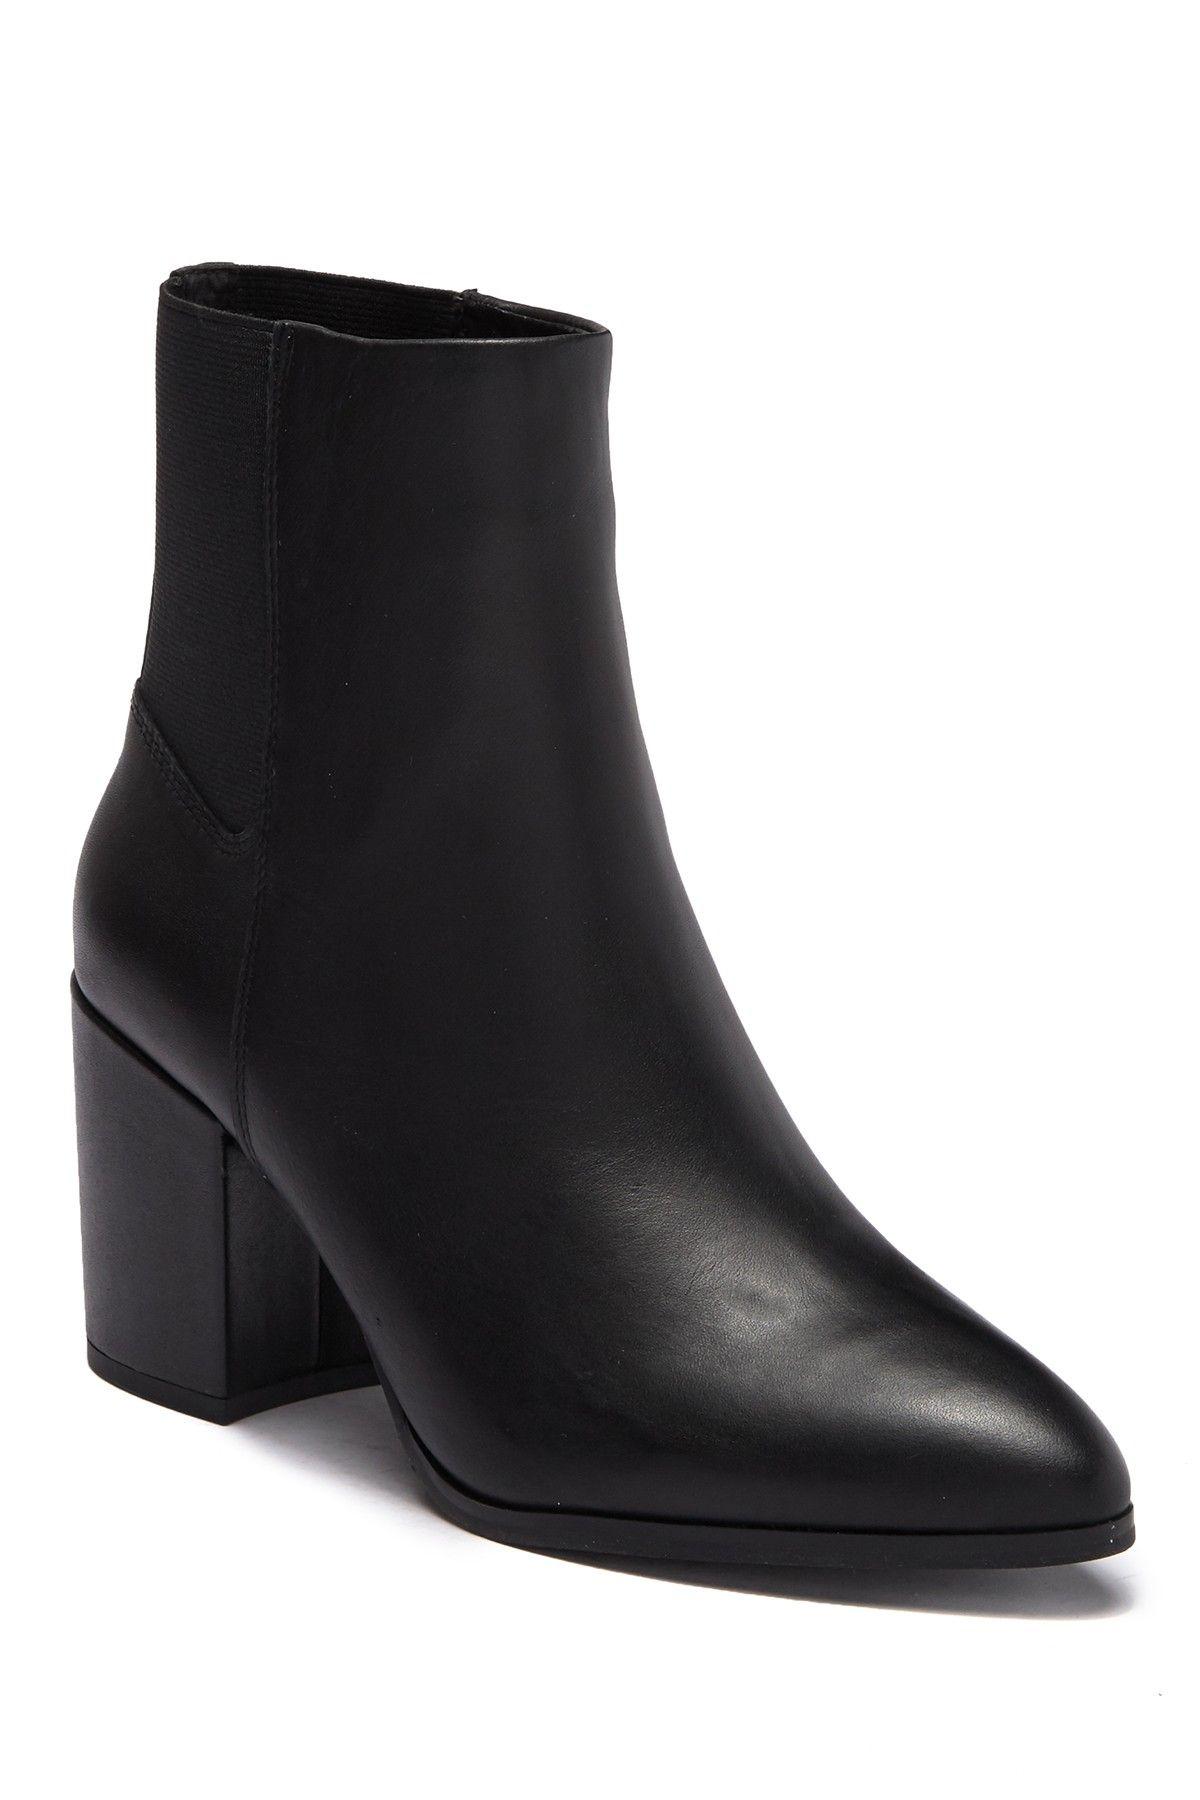 4ee12ad3d Steve Madden | Jeez Leather Block Heel Boot | Style Inspo | Block ...